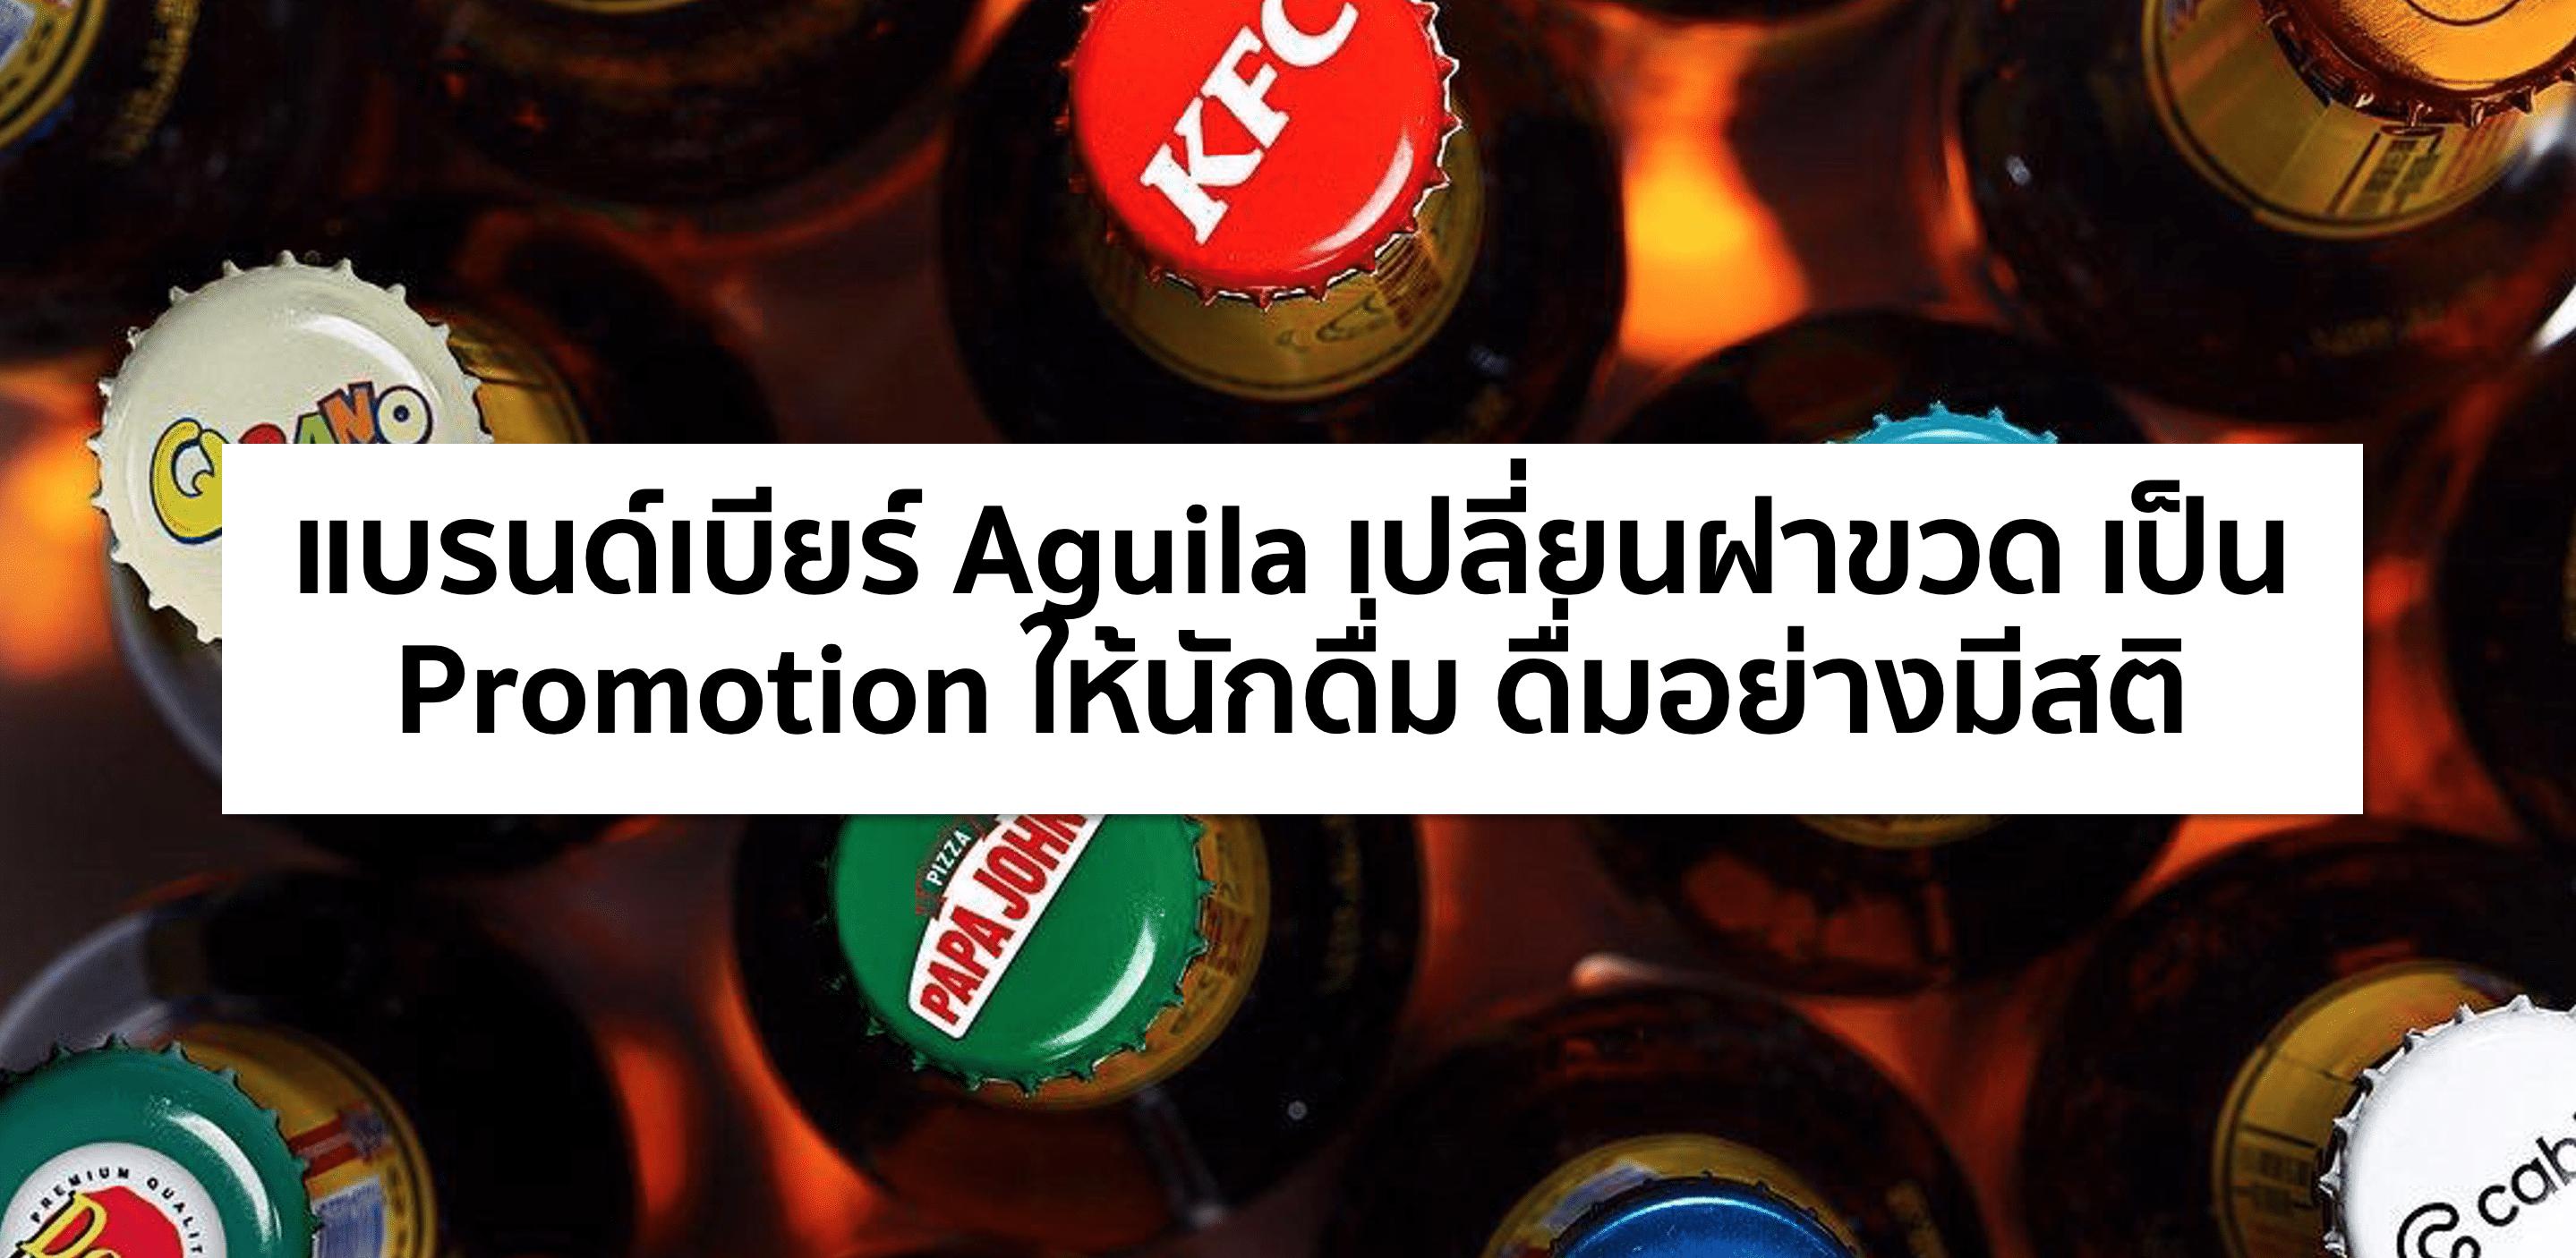 Beer Cap Project – ใช้ฝาเบียร์ ทำให้คนดื่มอย่างรับผิดชอบ